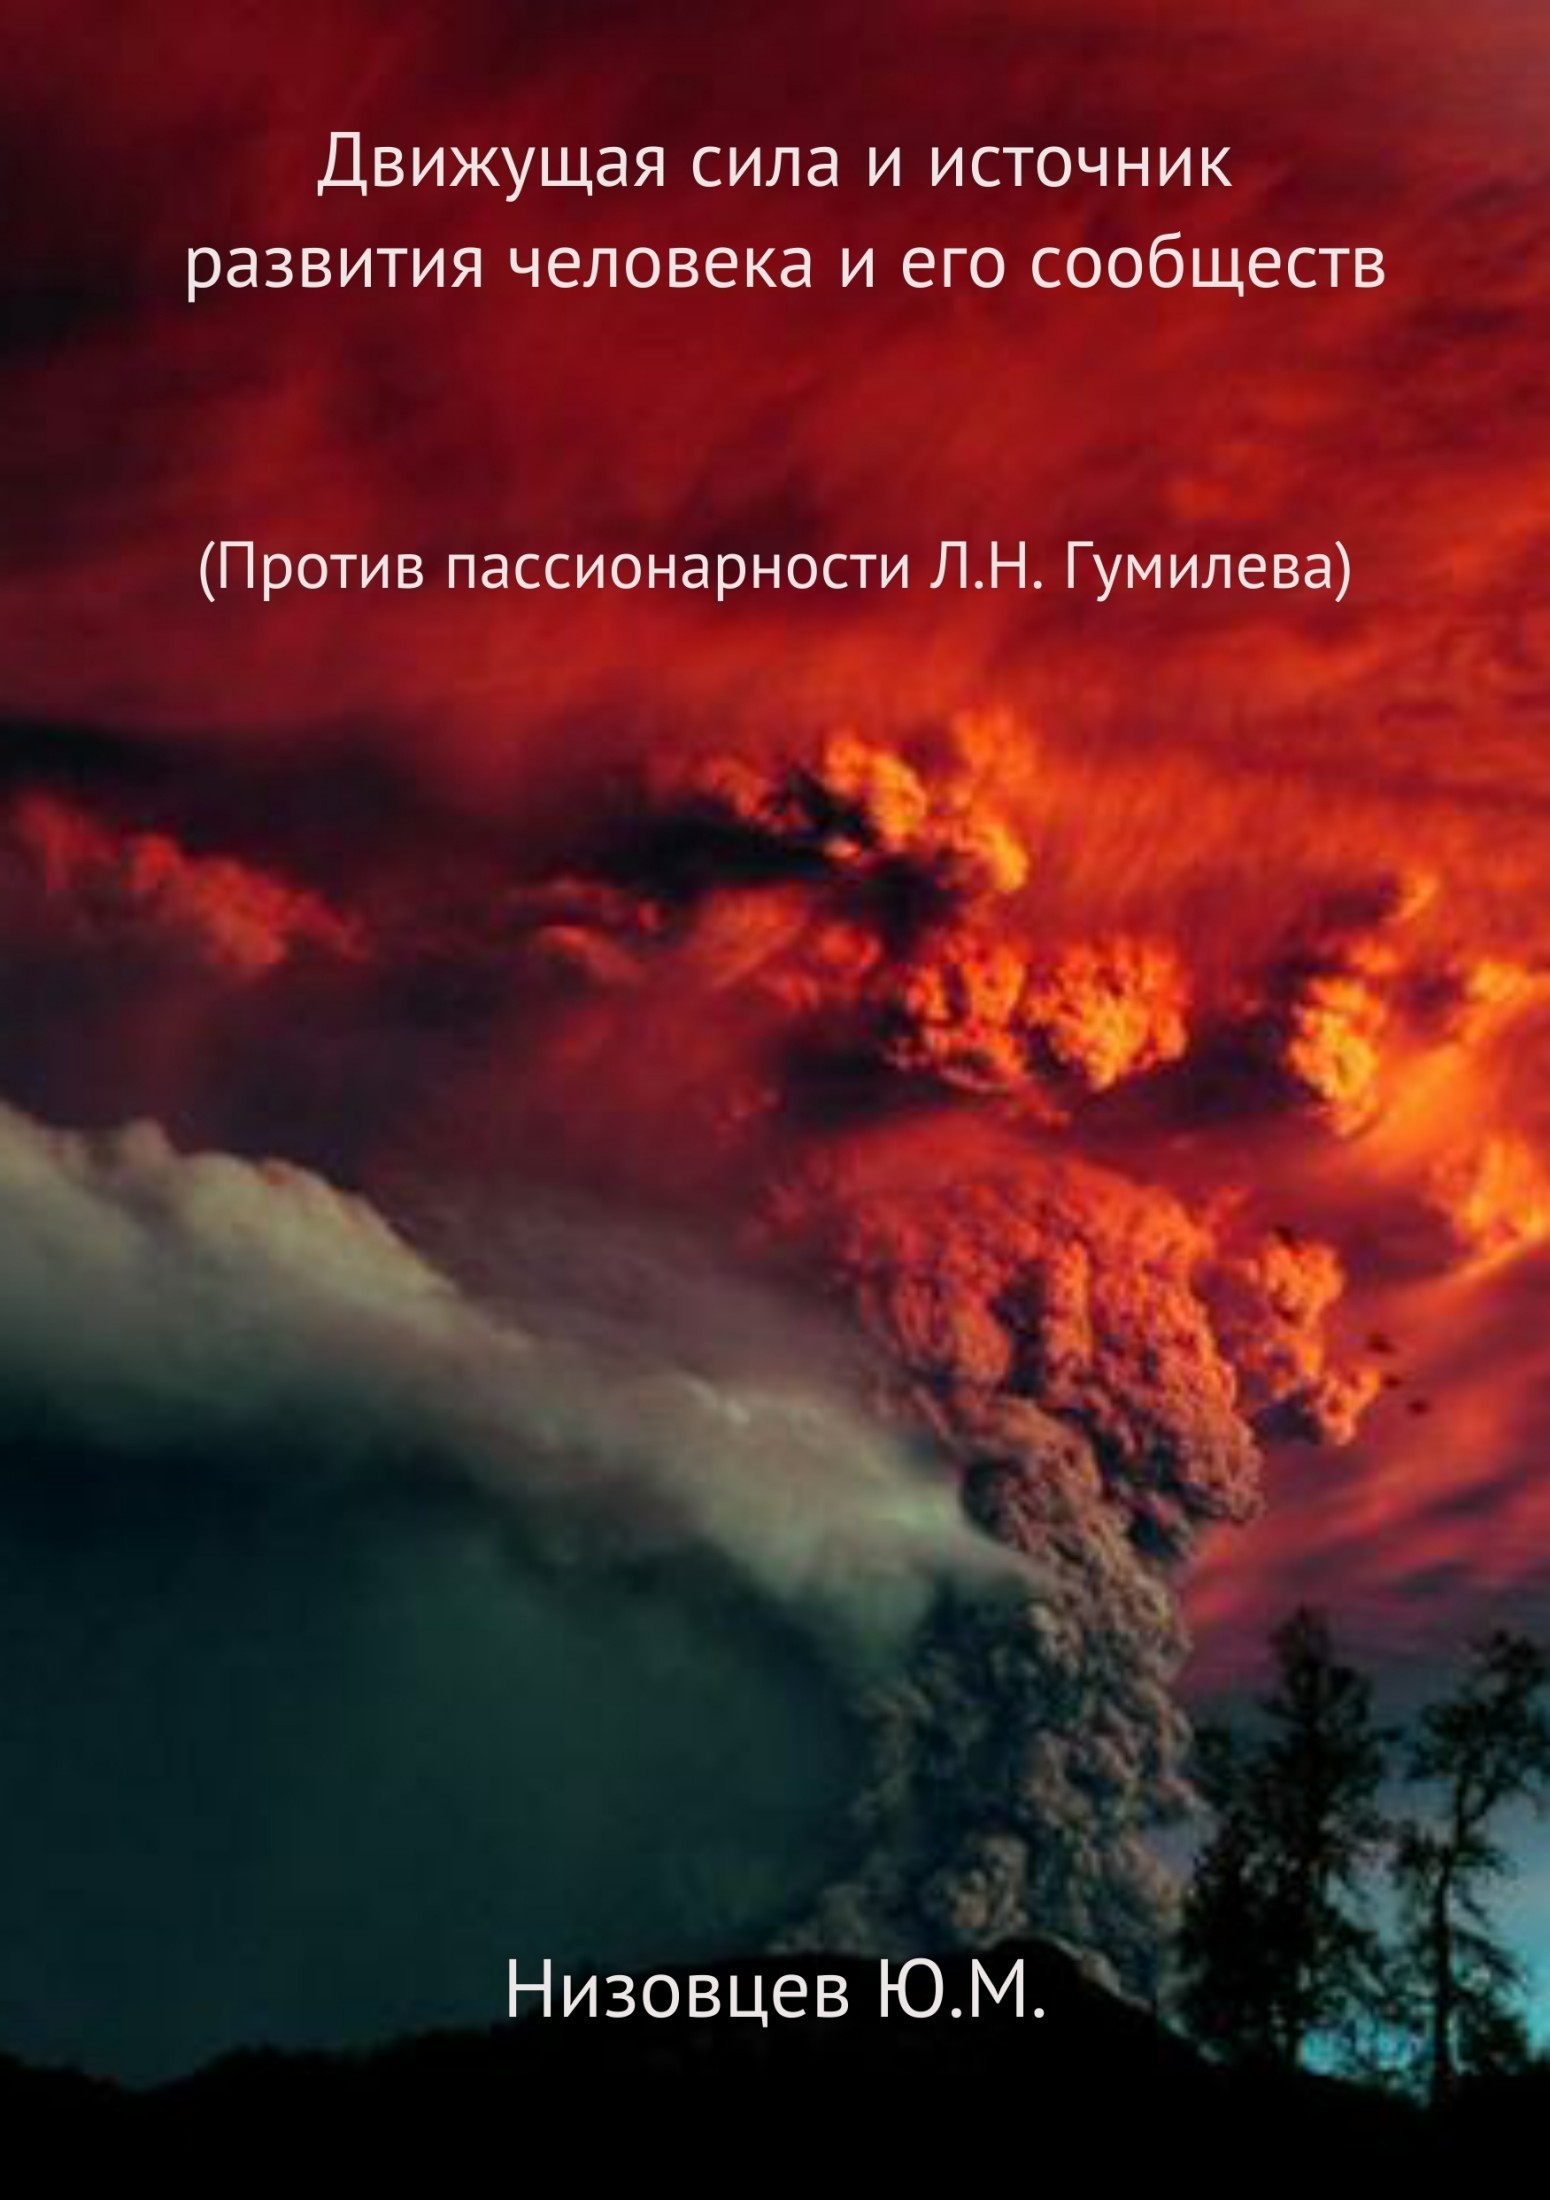 Юрий Михайлович Низовцев бесплатно